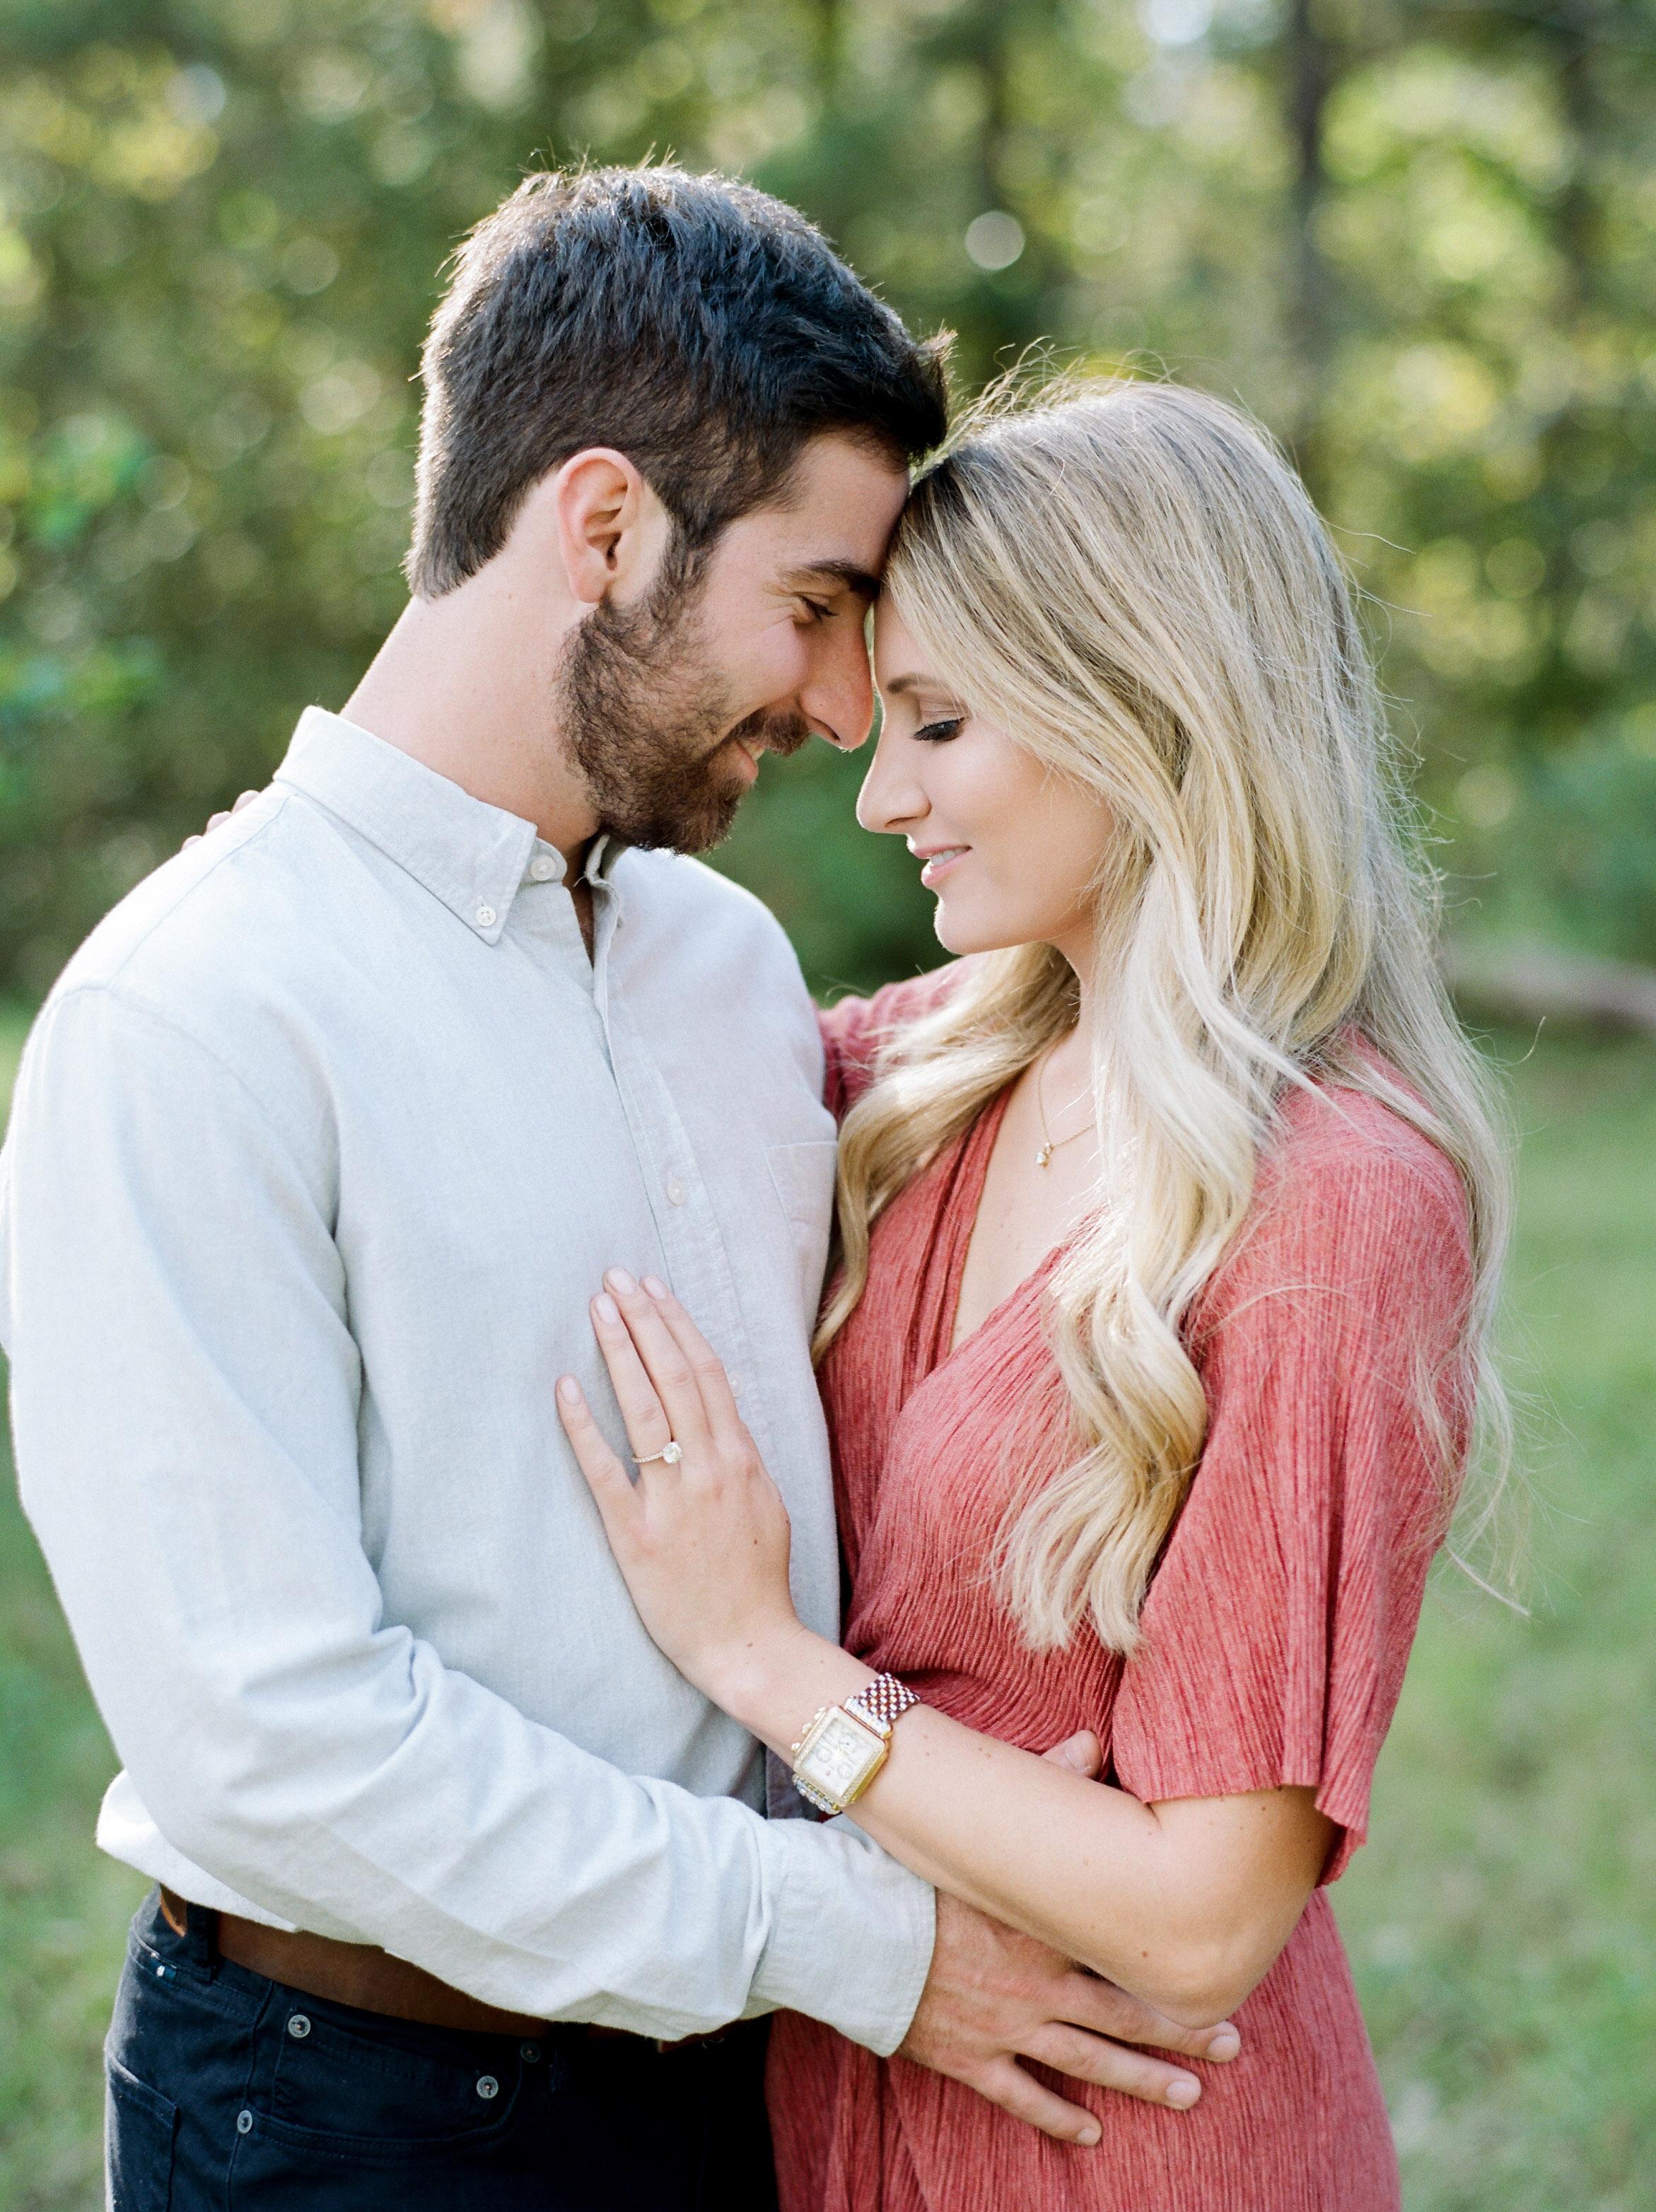 Houston-Fine-Art-Film-Destination-Wedding-Photographer-Top-Best-Luxury-Josh-Dana-Fernandez-Photographer-Austin-Texas-10.jpg